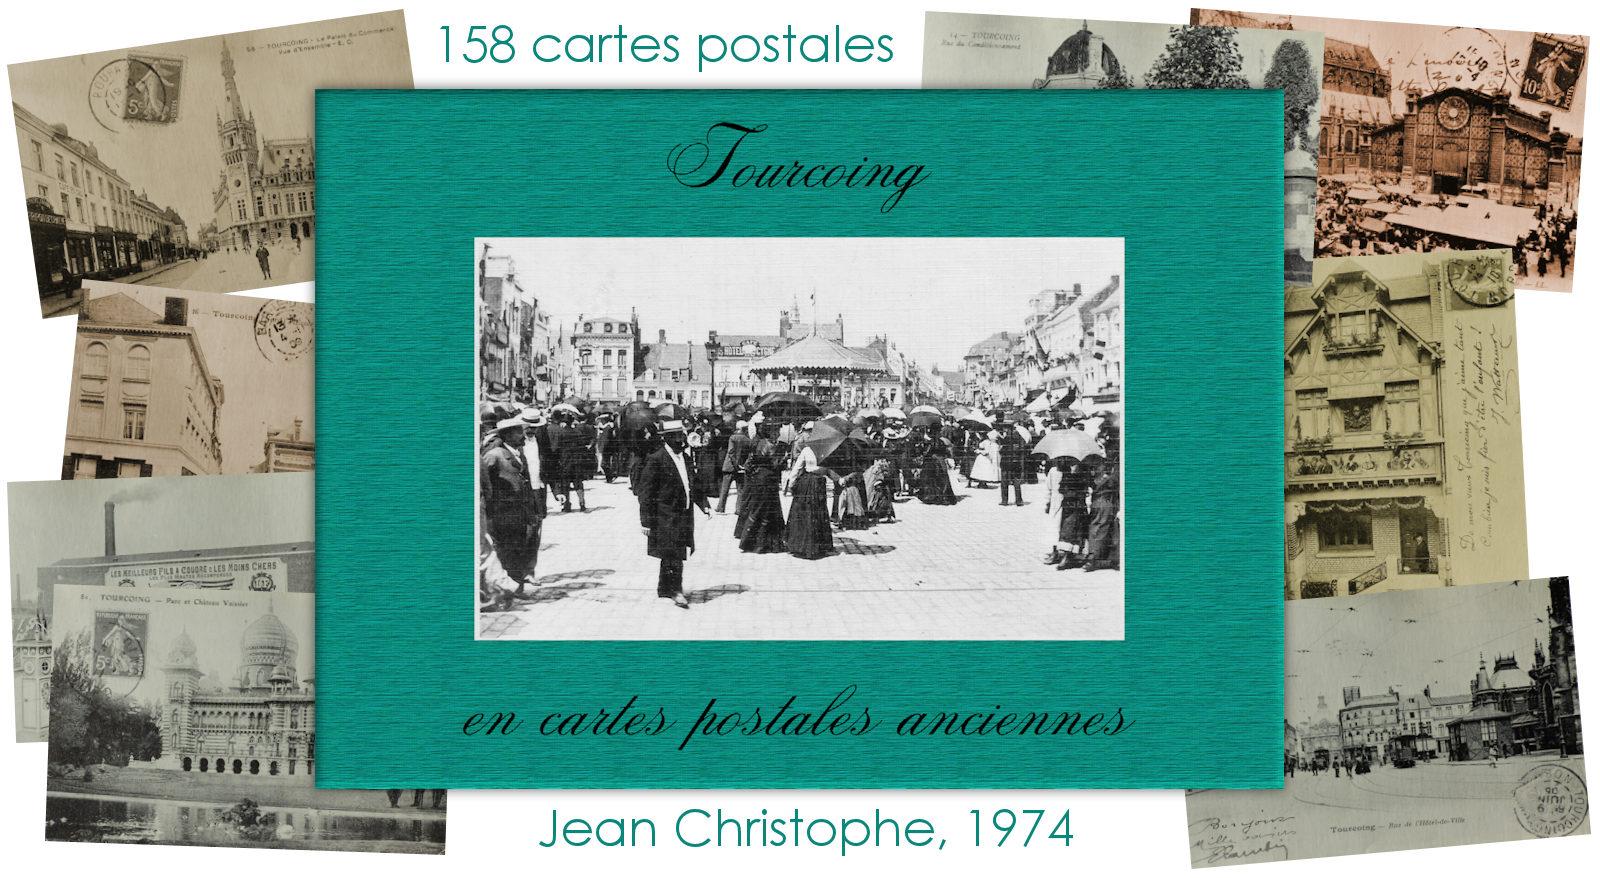 Jean Christophe, Tourcoing en cartes postales anciennes, 1974.